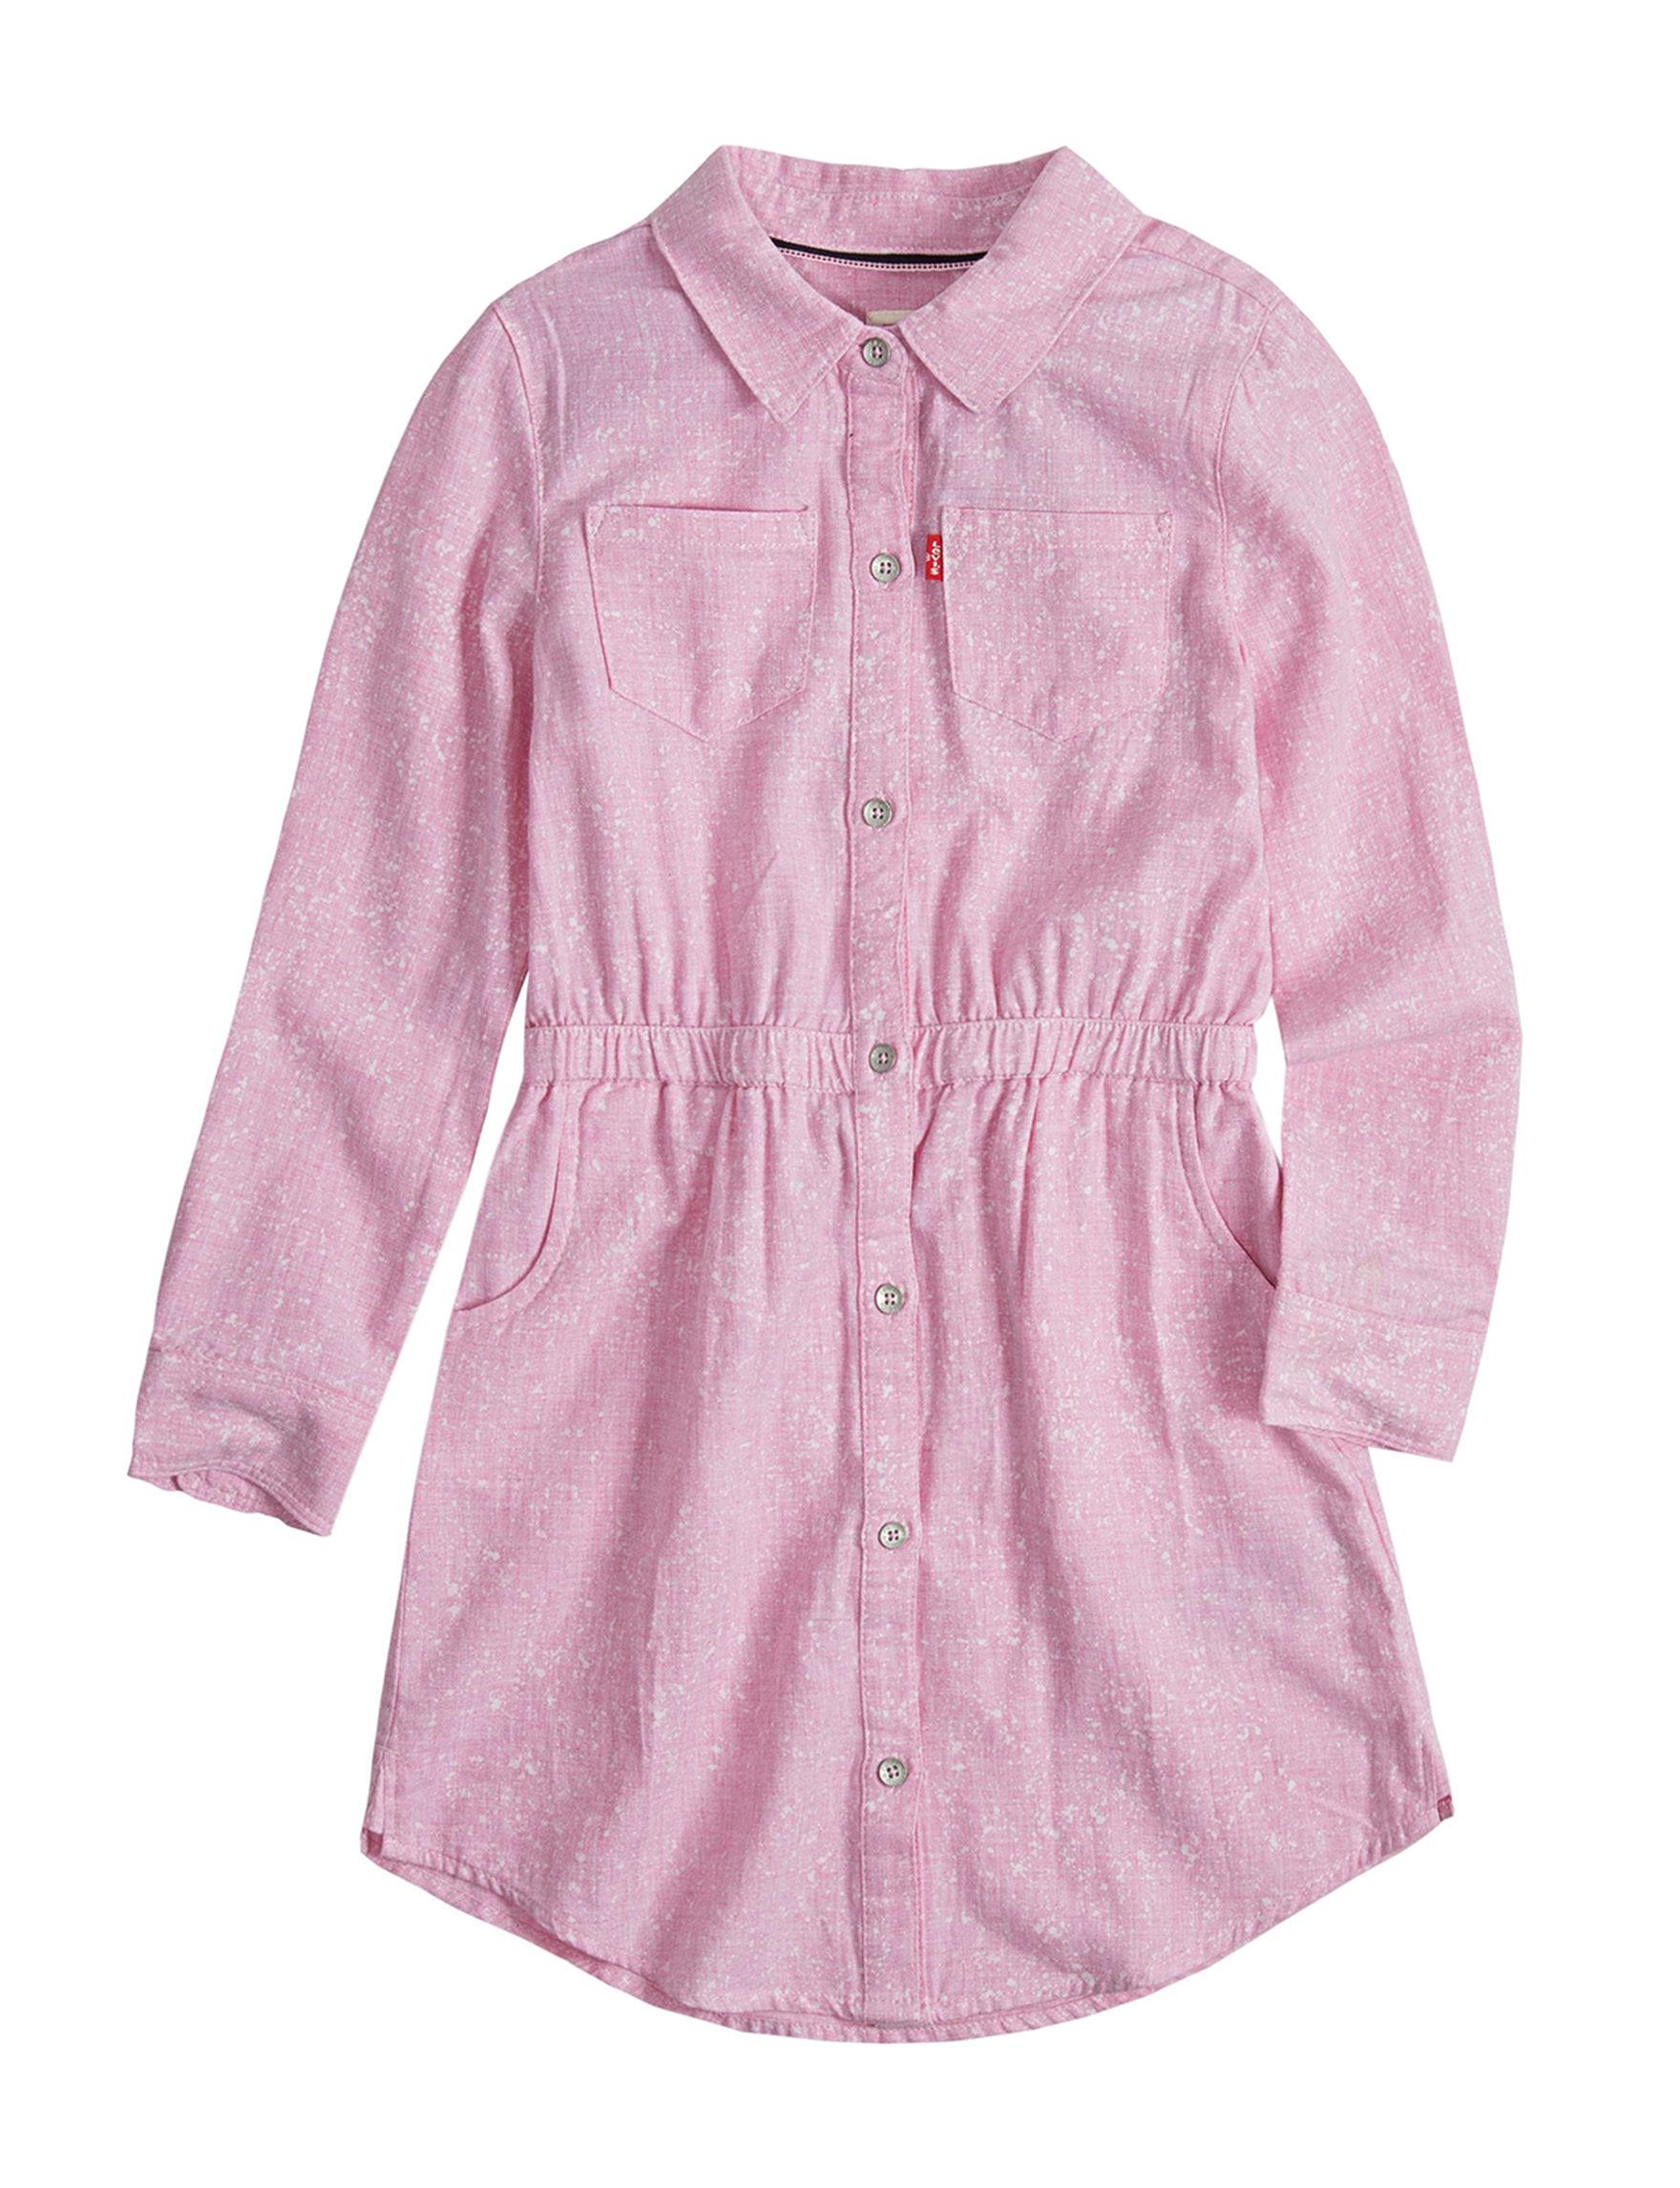 Levi's Pink